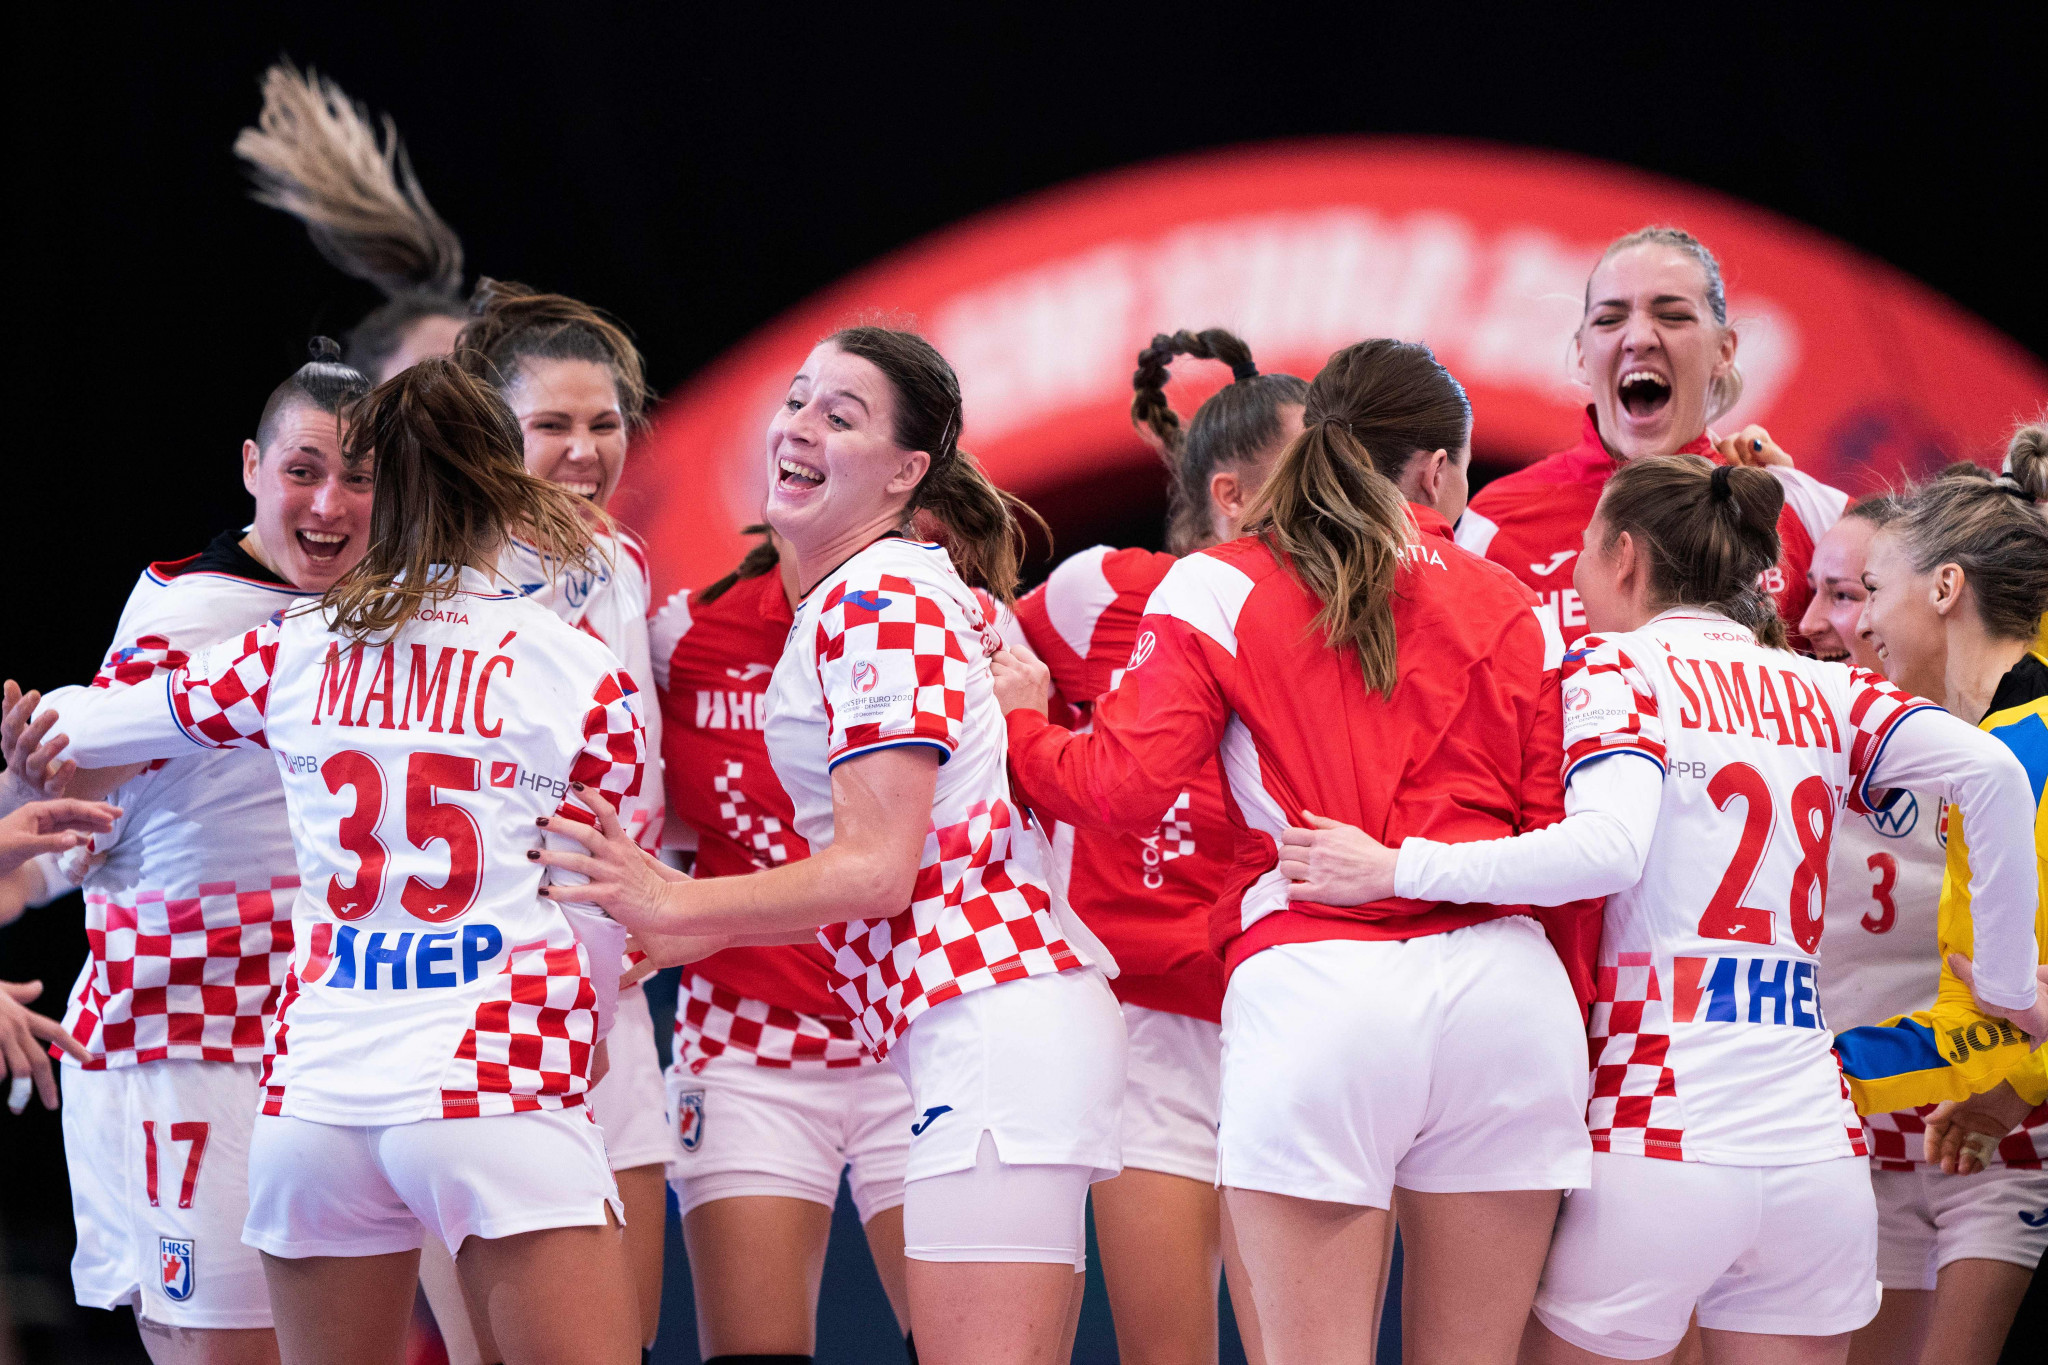 Croatia are through to a first-ever European Women's Handball Championship semi-final ©Getty Images